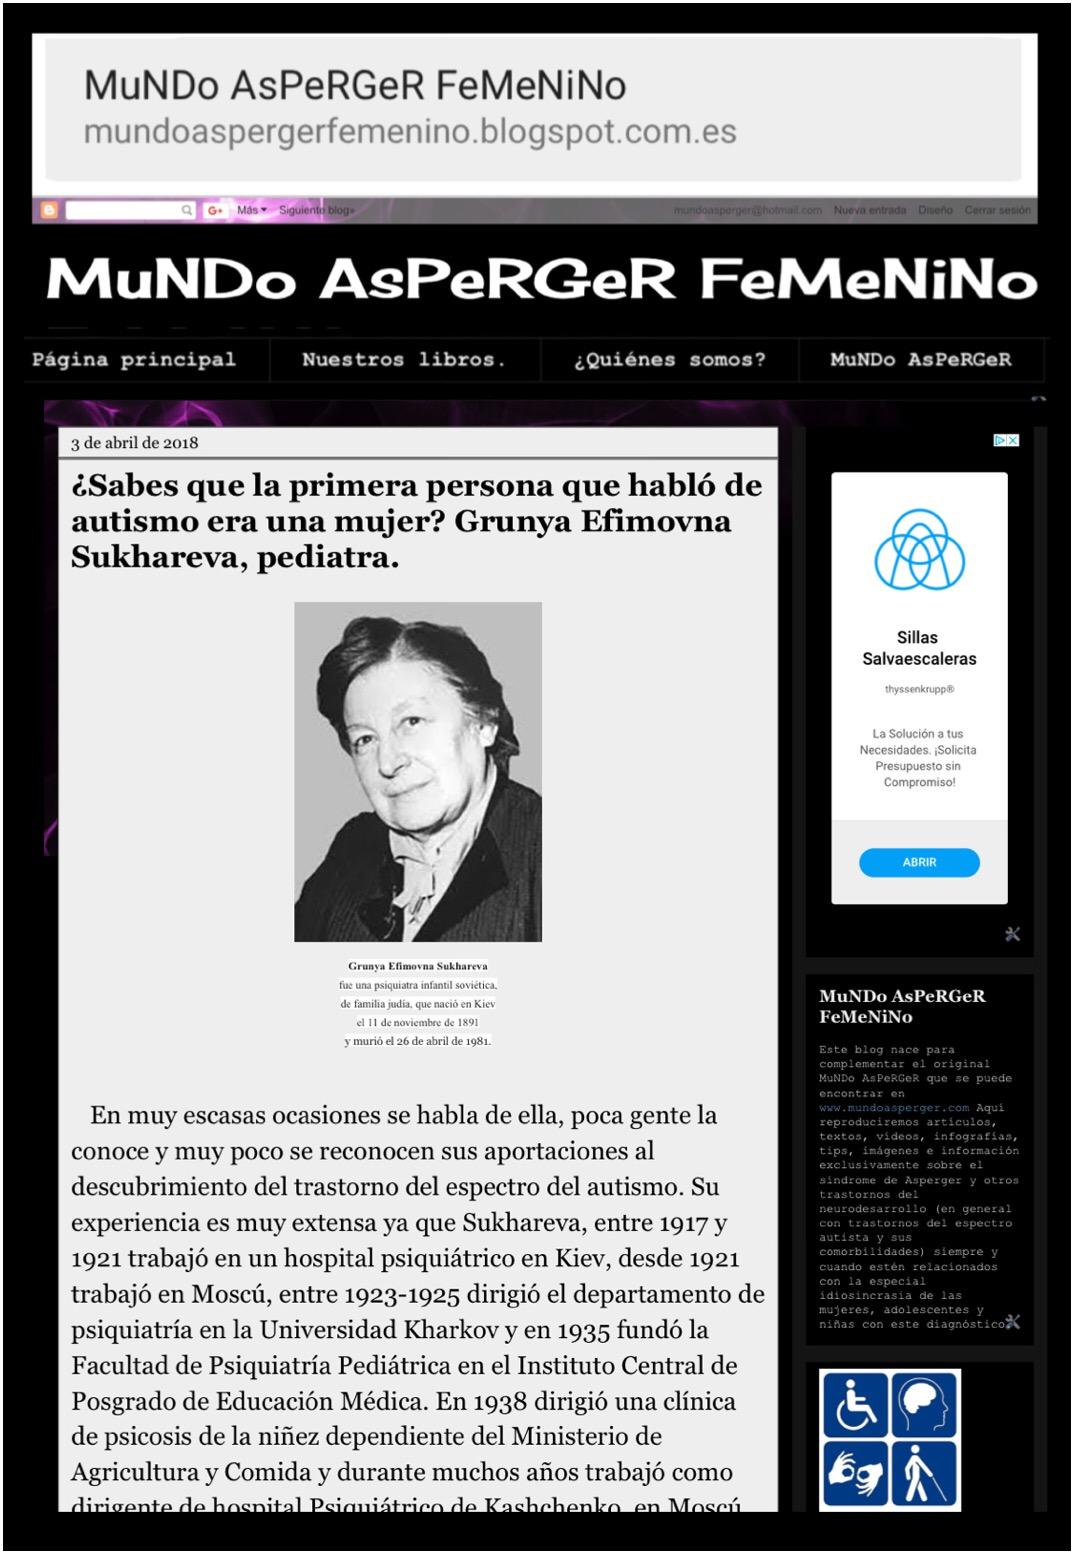 AsPeRGeR FeMeNiNo